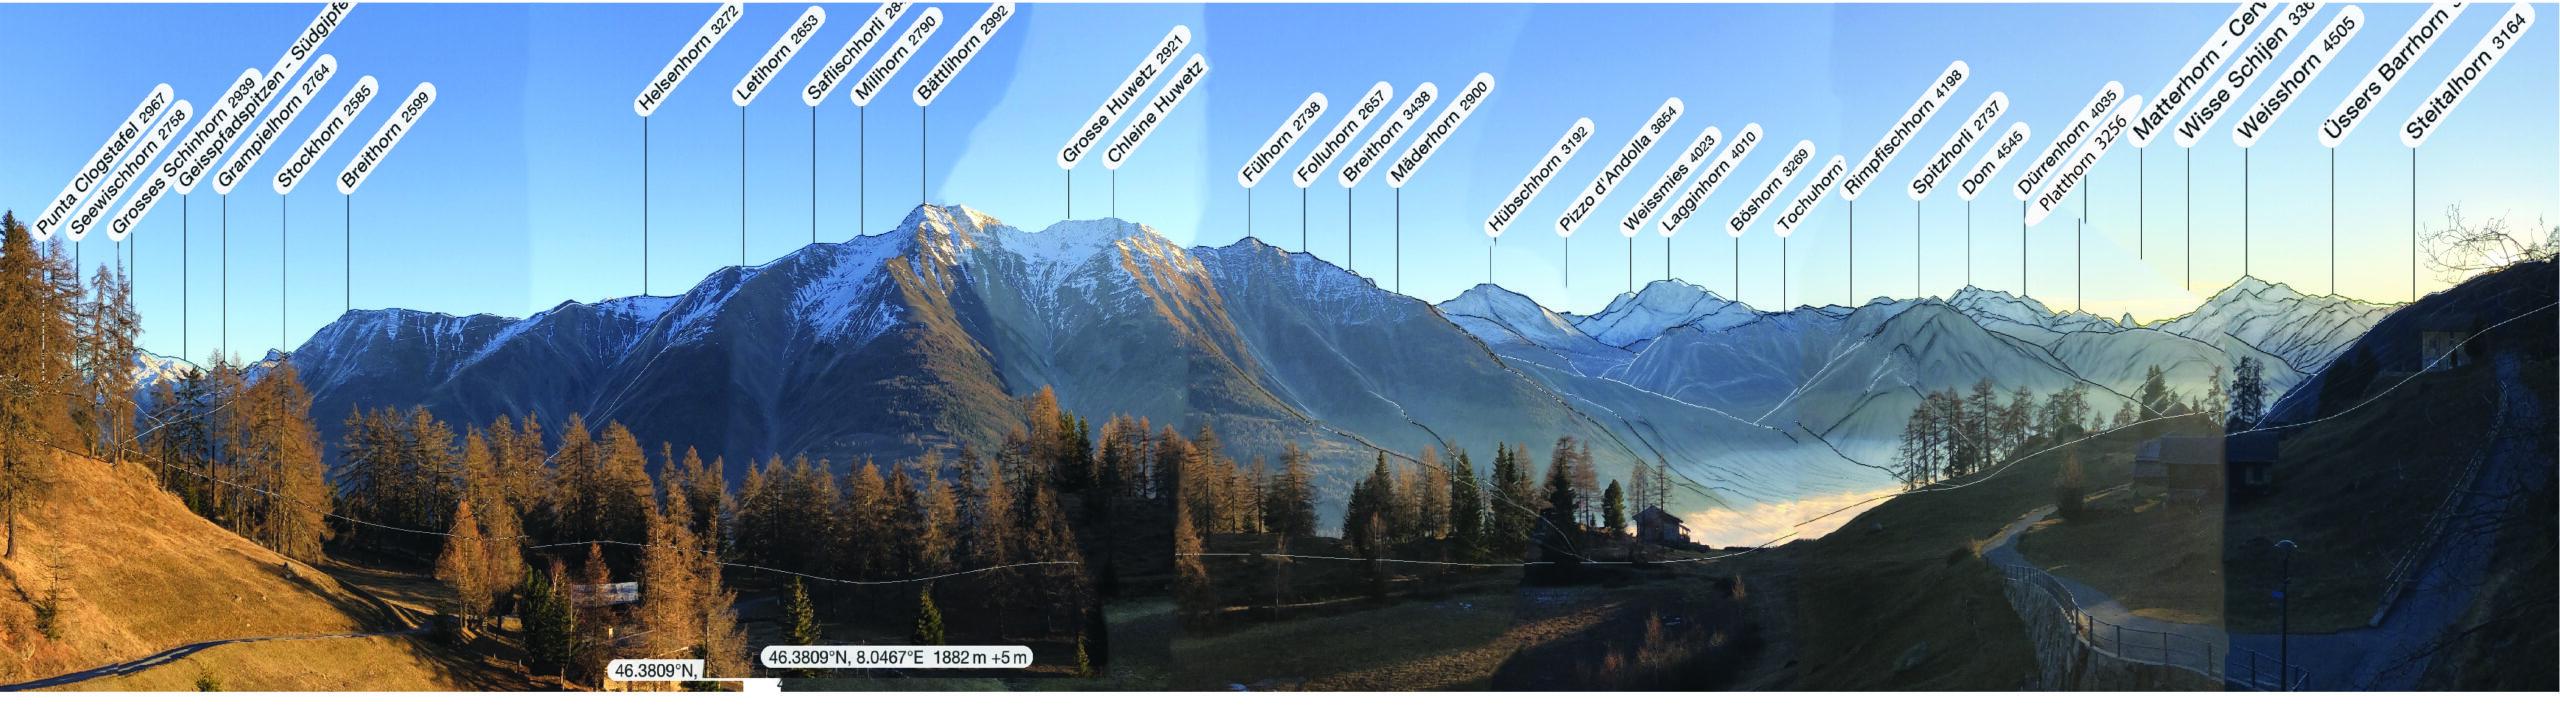 Panorama mit Bergnamen